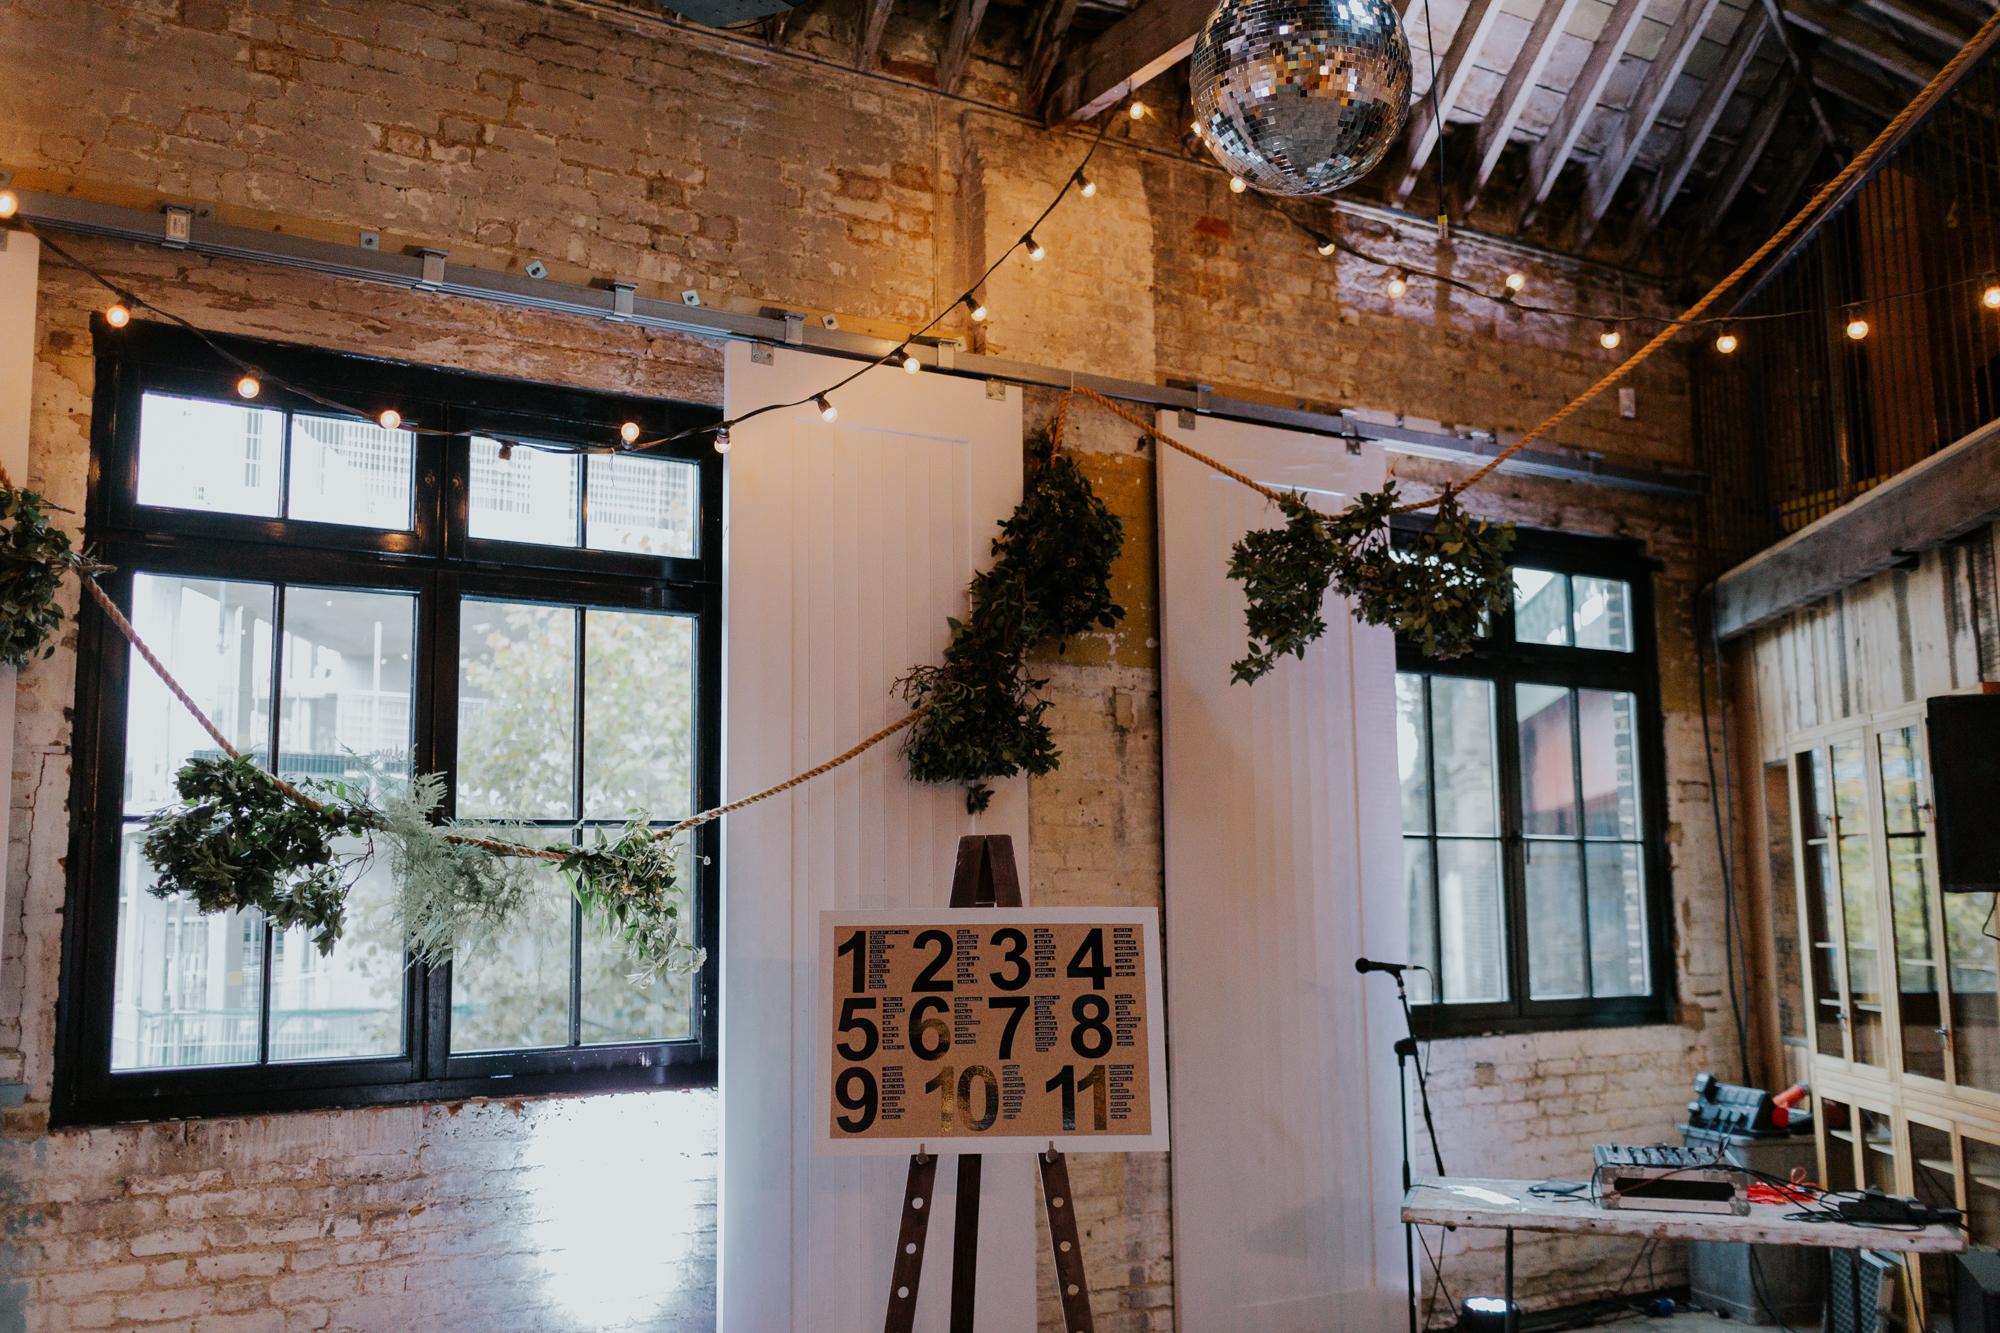 Quirky Venue, Non-traditional wedding planner, London Wedding coordination, Event Bar, Bespoke weddings, Brixton East 1871 Wedding, Streetfood wedding, informal, Stylish, Worm London